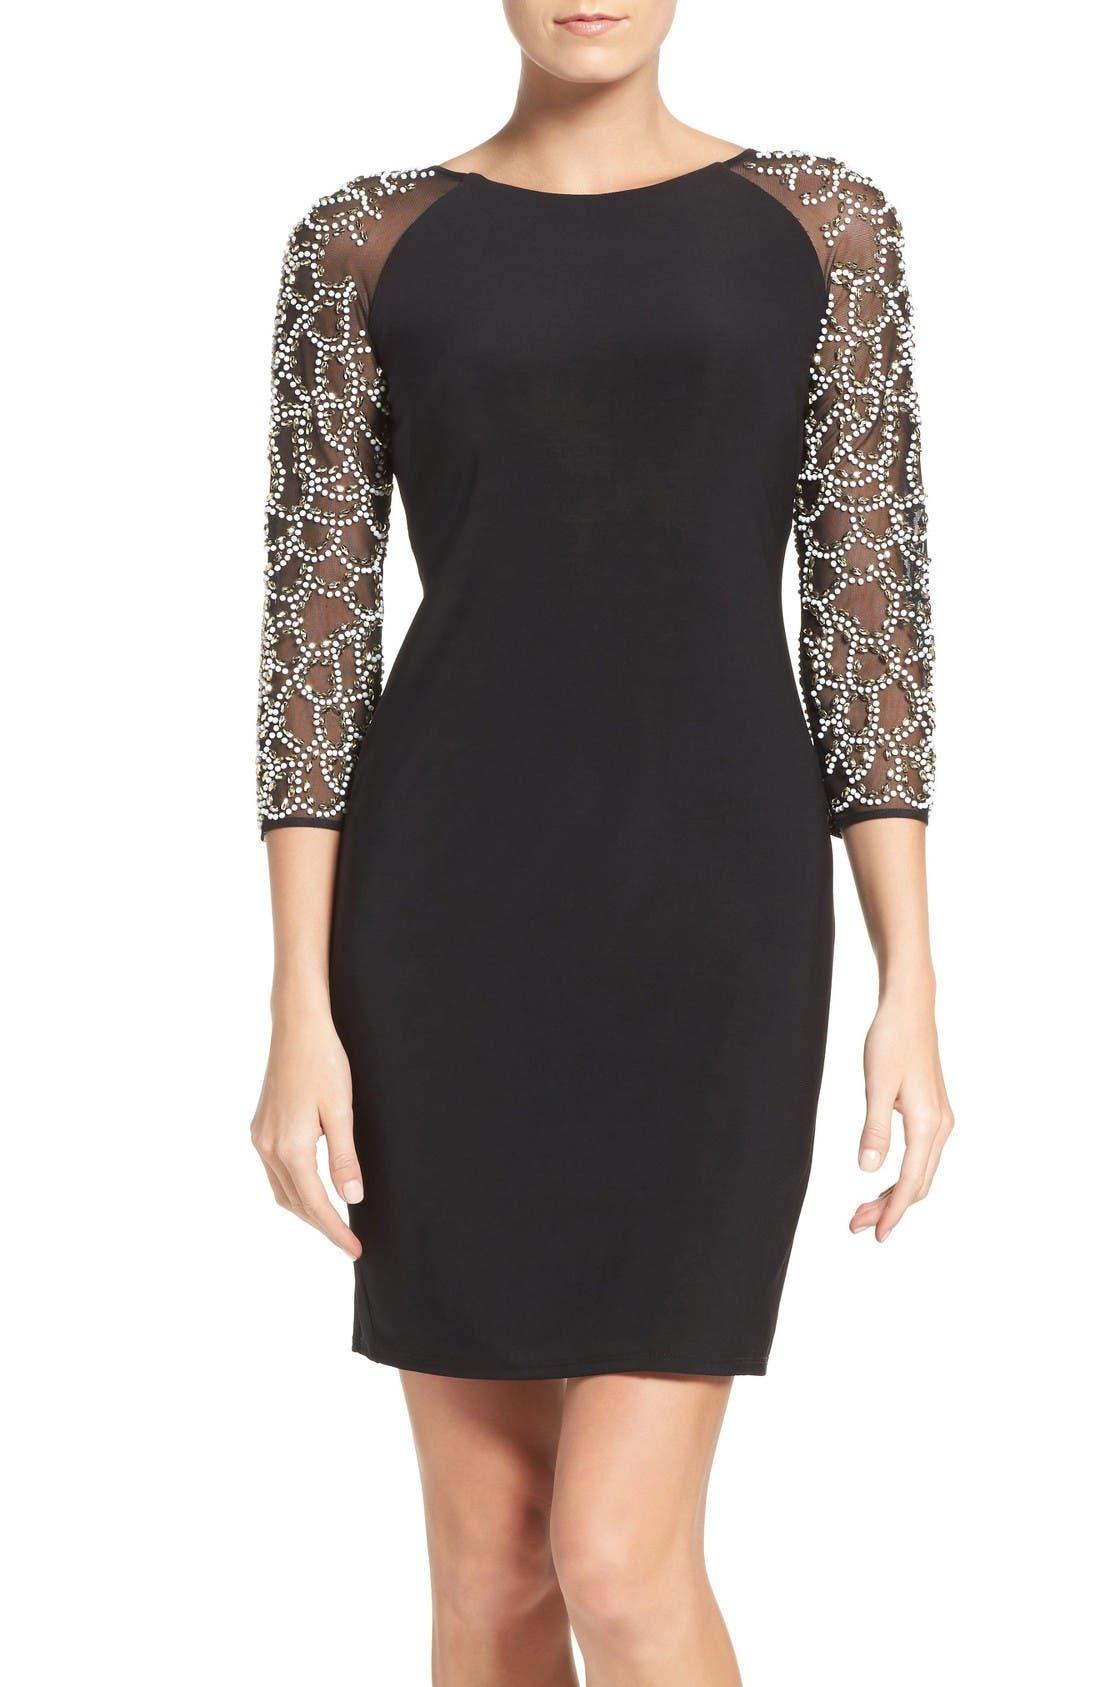 CHETTA B Embellished Sheer Three Quarter Sleeve Dress